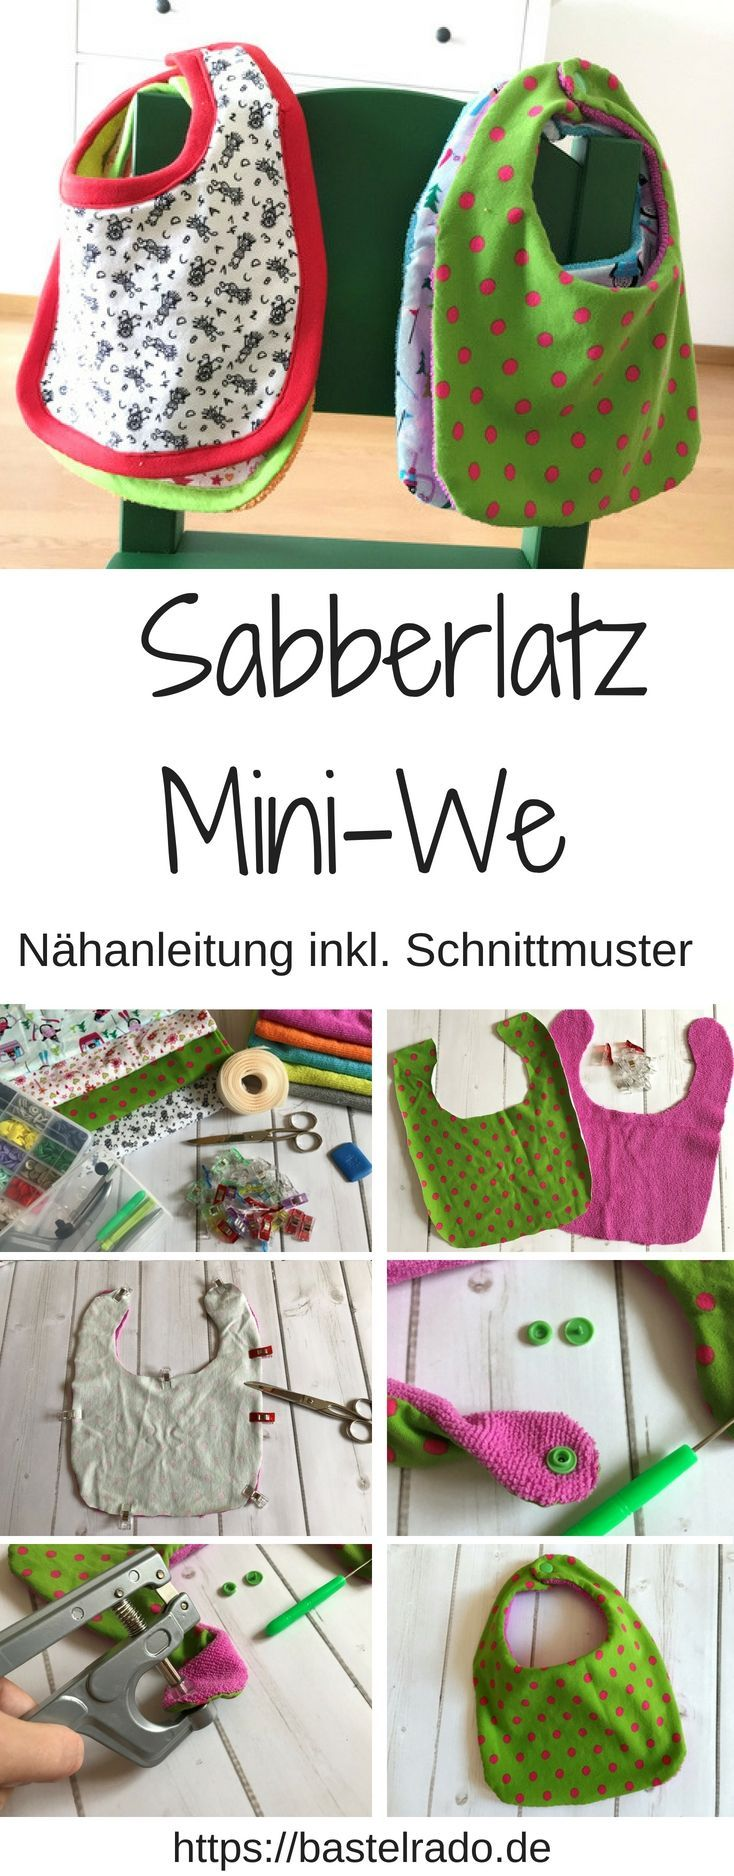 Photo of Sabberlatz Mini-We – Nähanleitung inkl. Schnittmuster » BASTELRADO